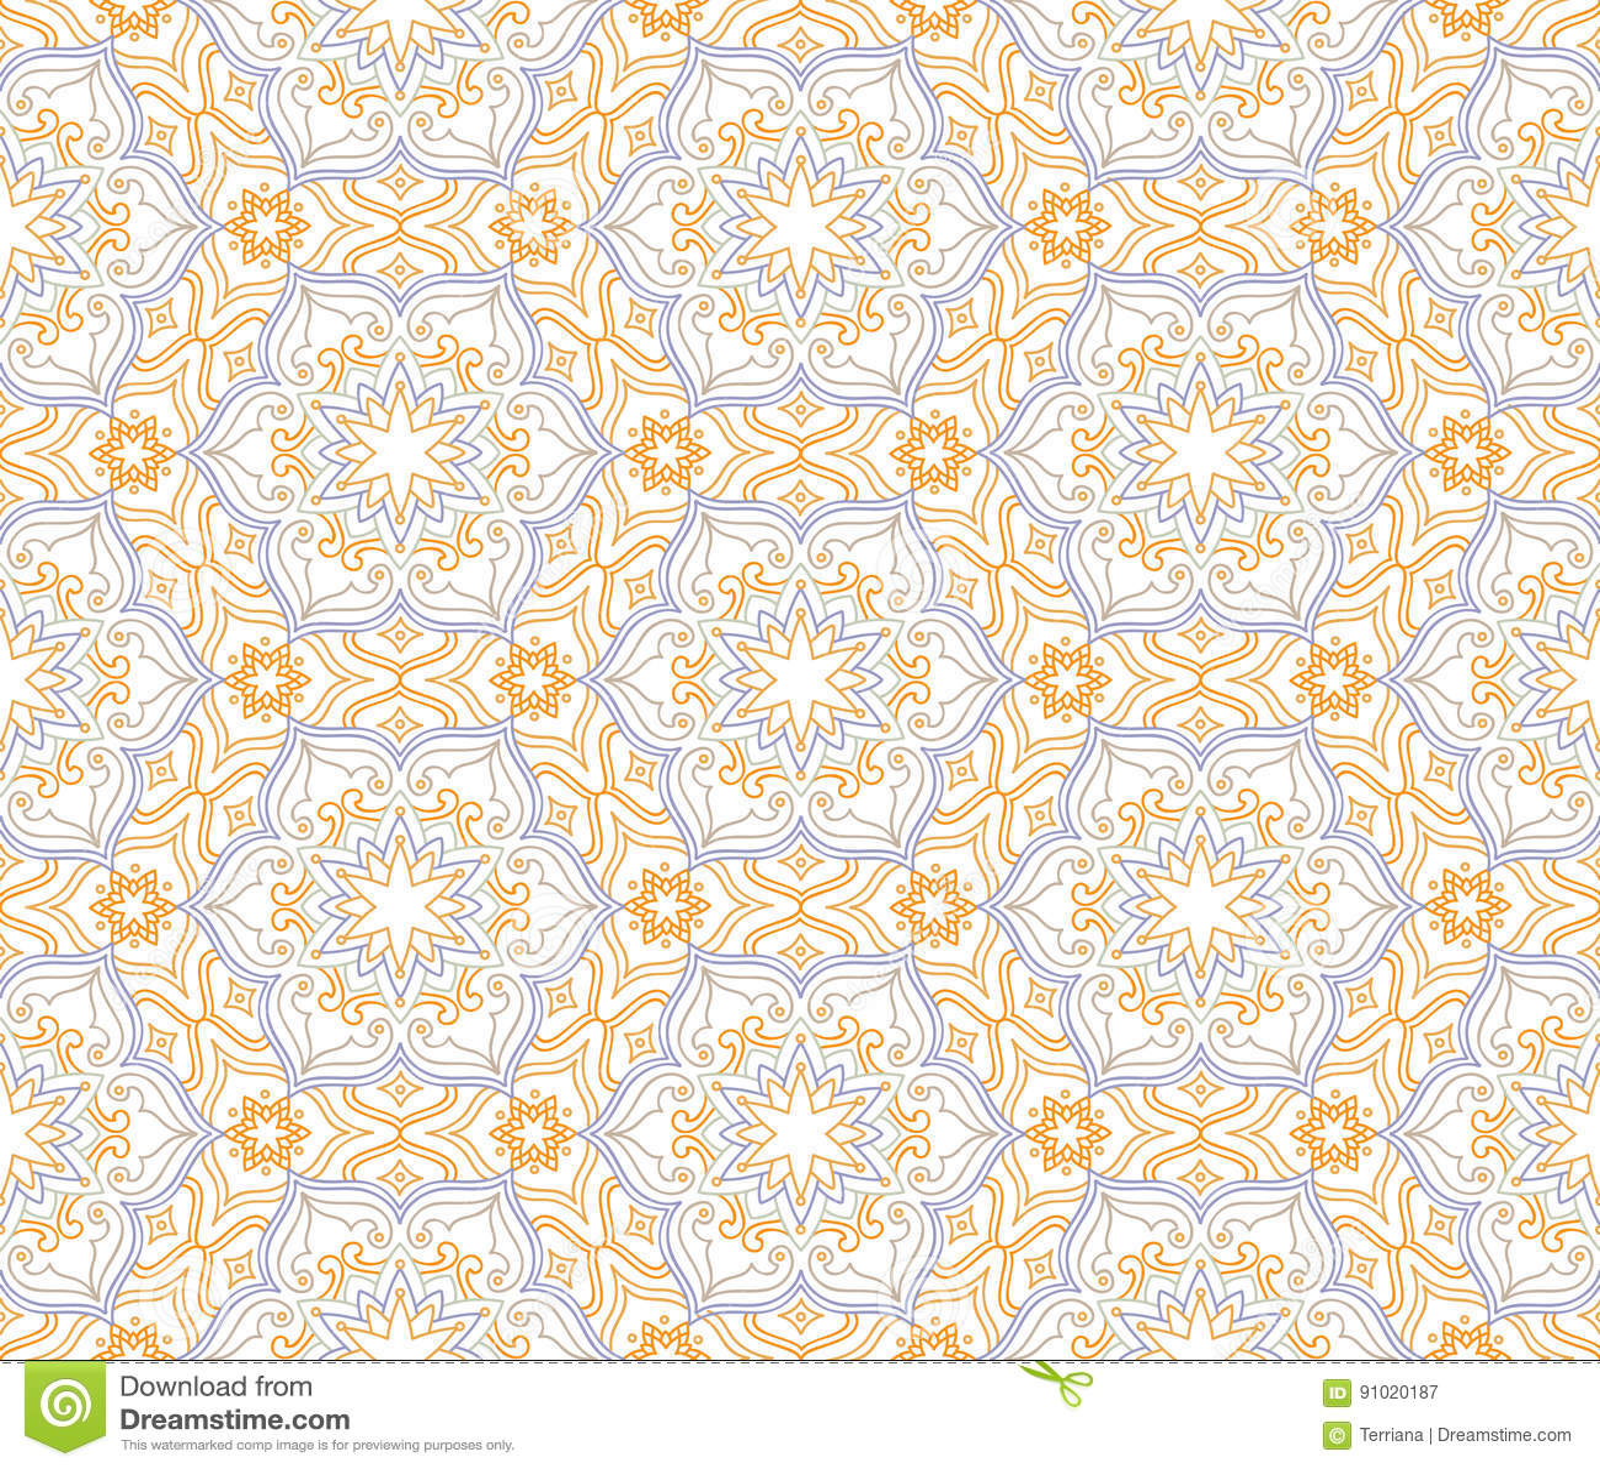 Flourish Mosaic Tiled Pattern Floral Oriental Ethnic